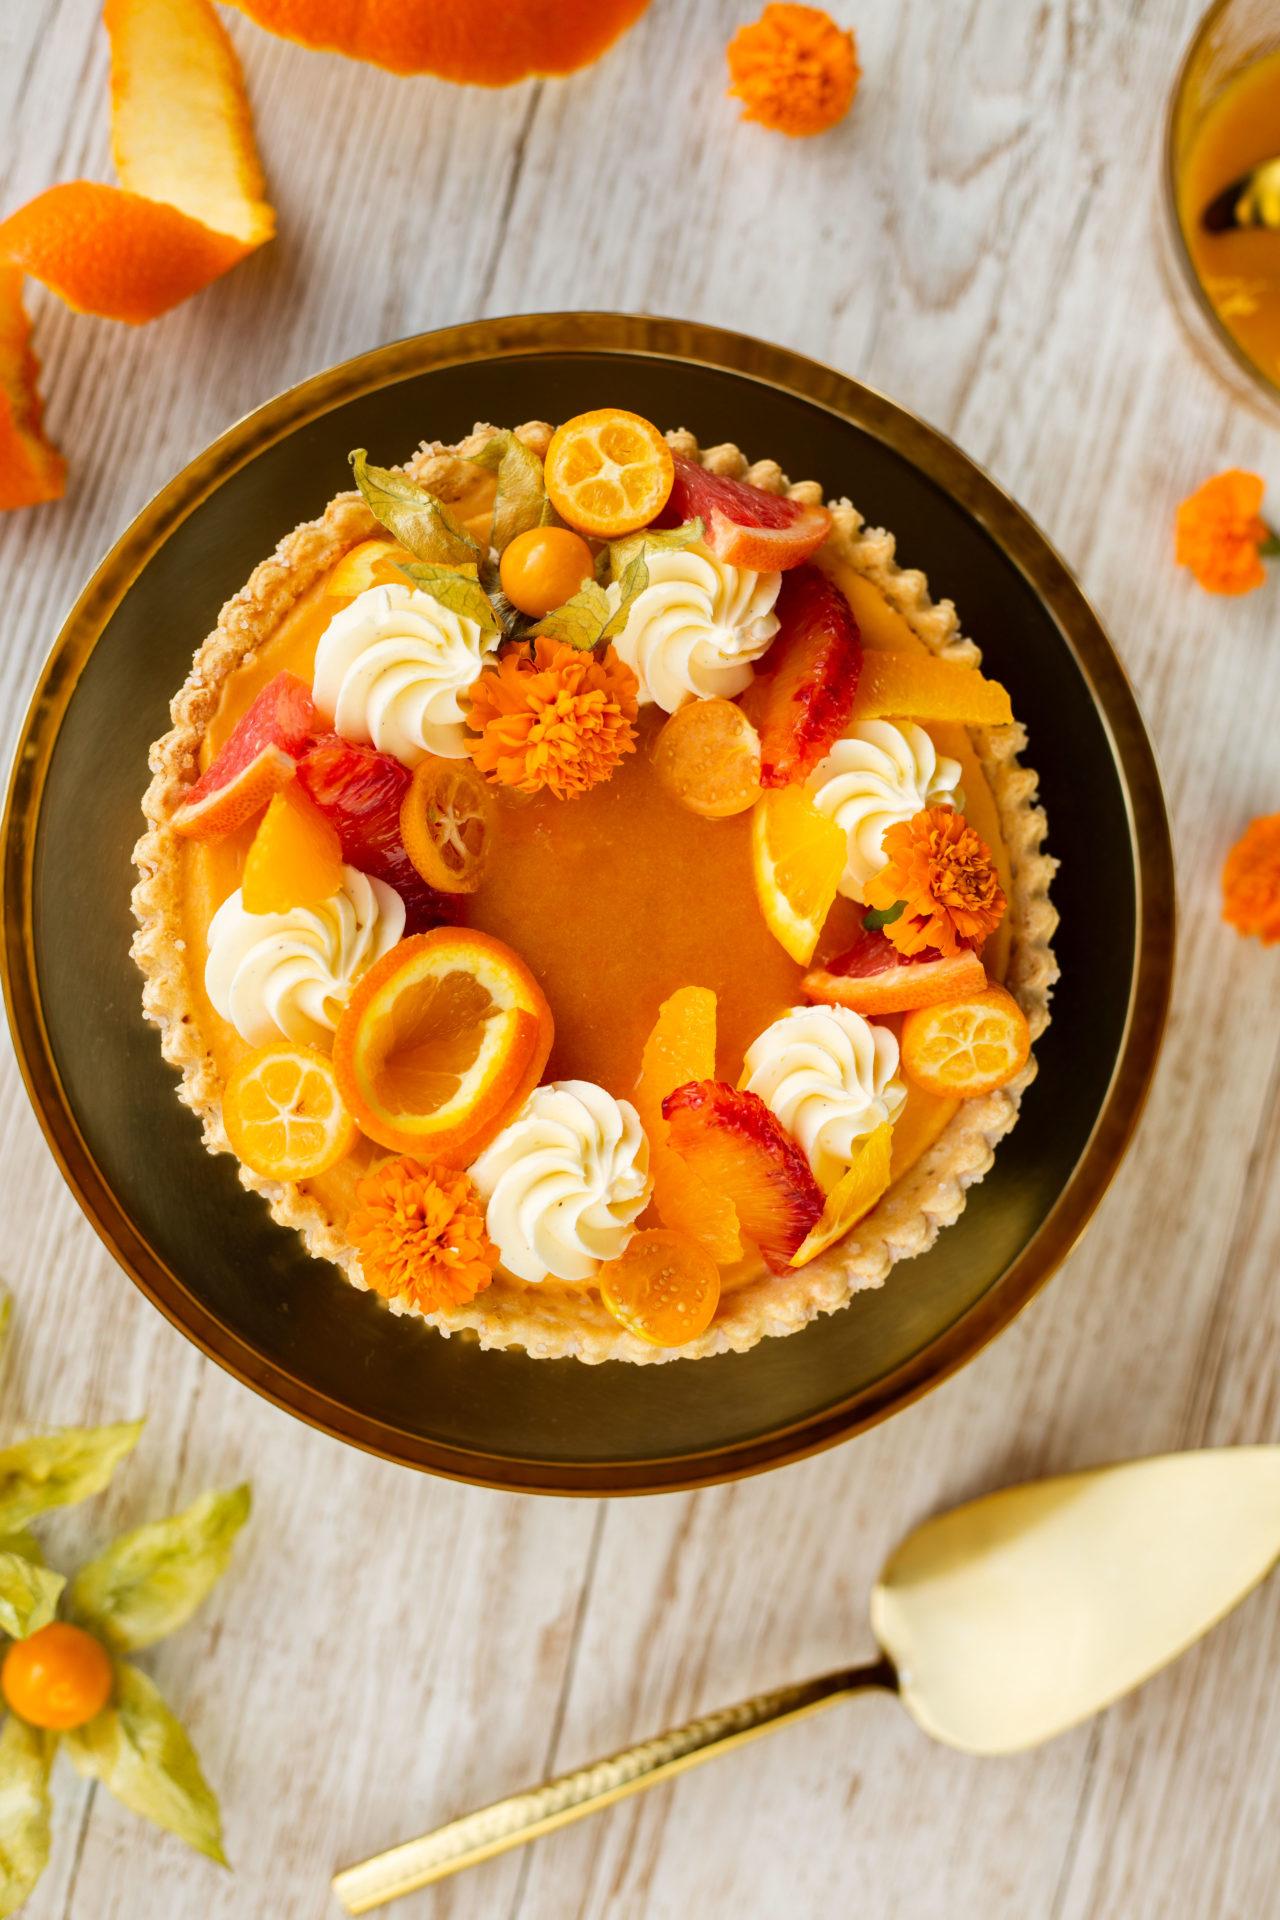 Food fotografie oranje taart